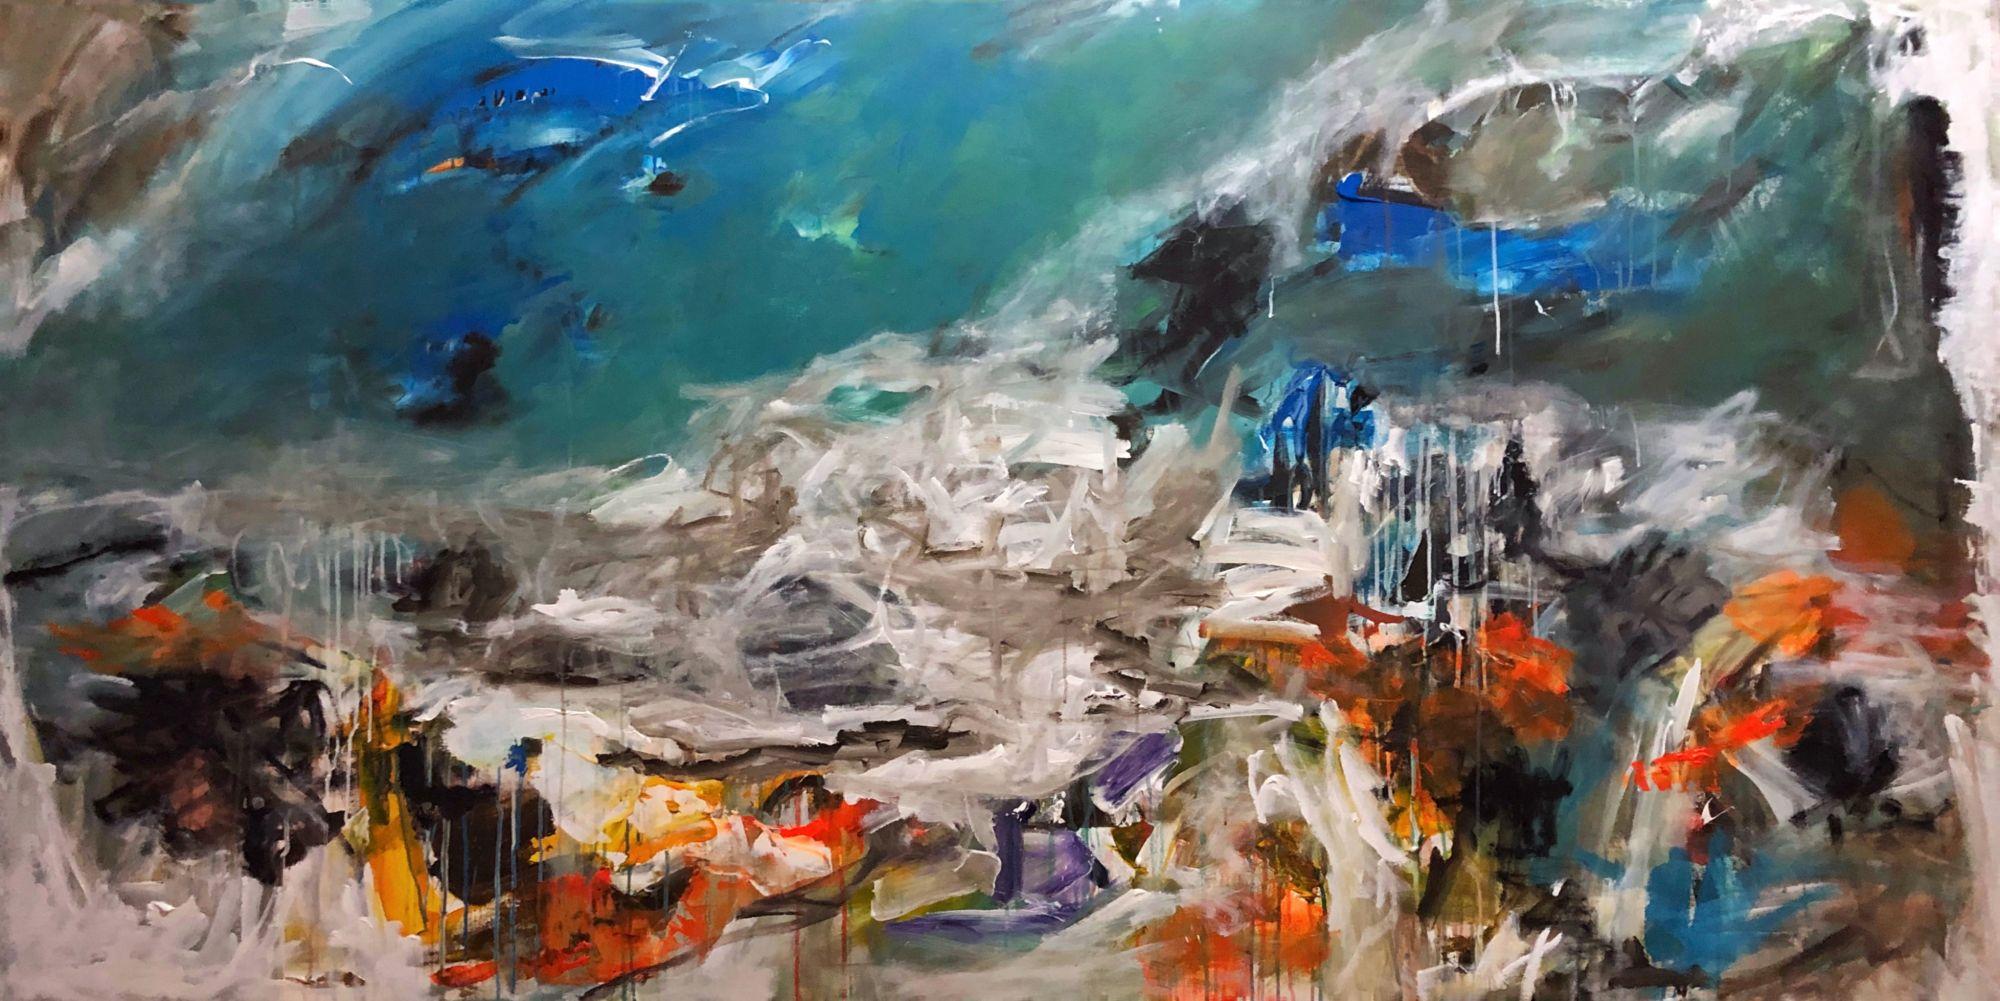 Underwater Seascape by Kenneth Montegrande